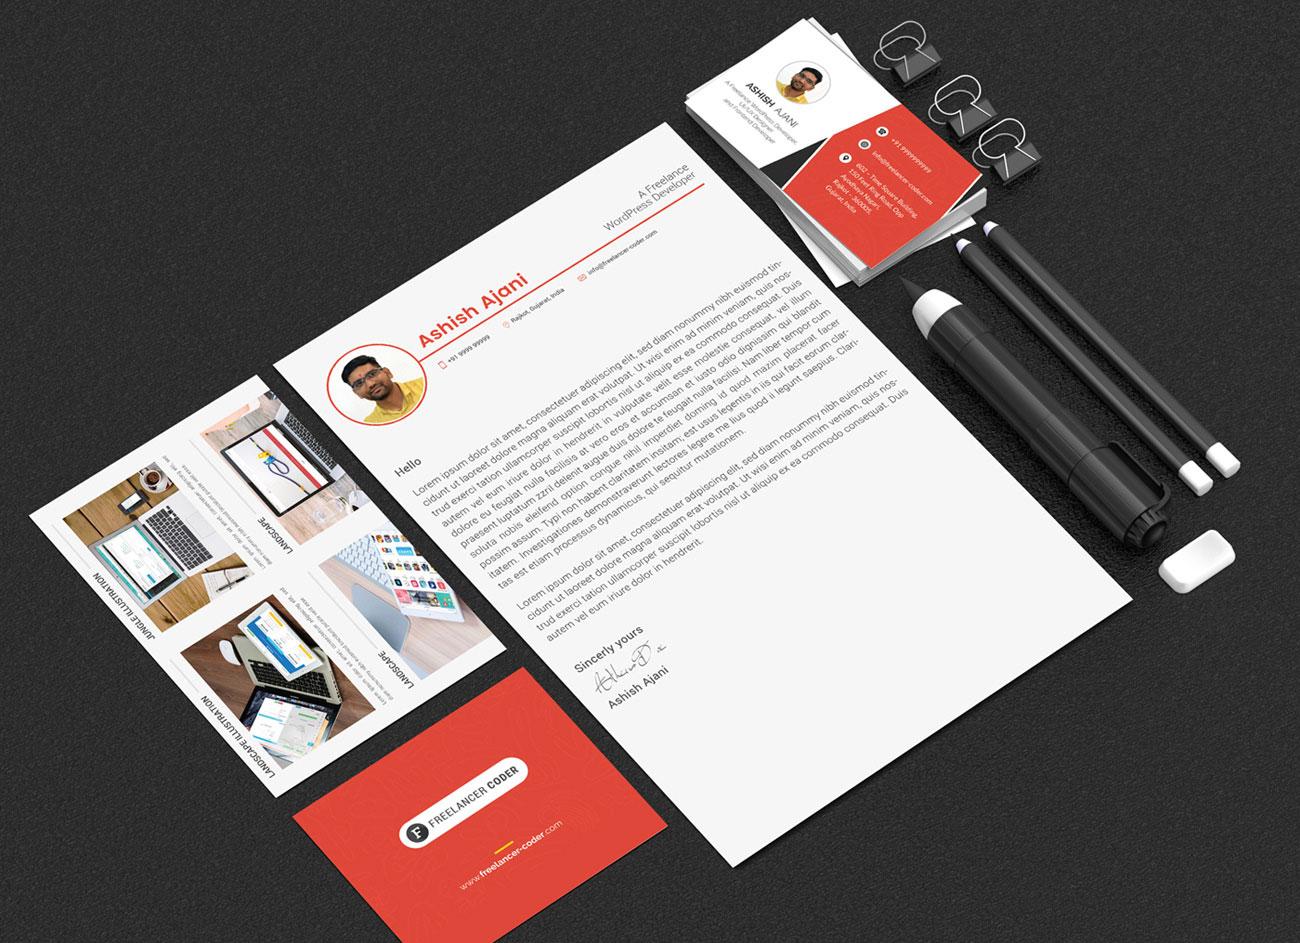 Free-PSD-Resume-Template-&-Cover-Letter-for-PHP-&-Wordpress-Developer-7